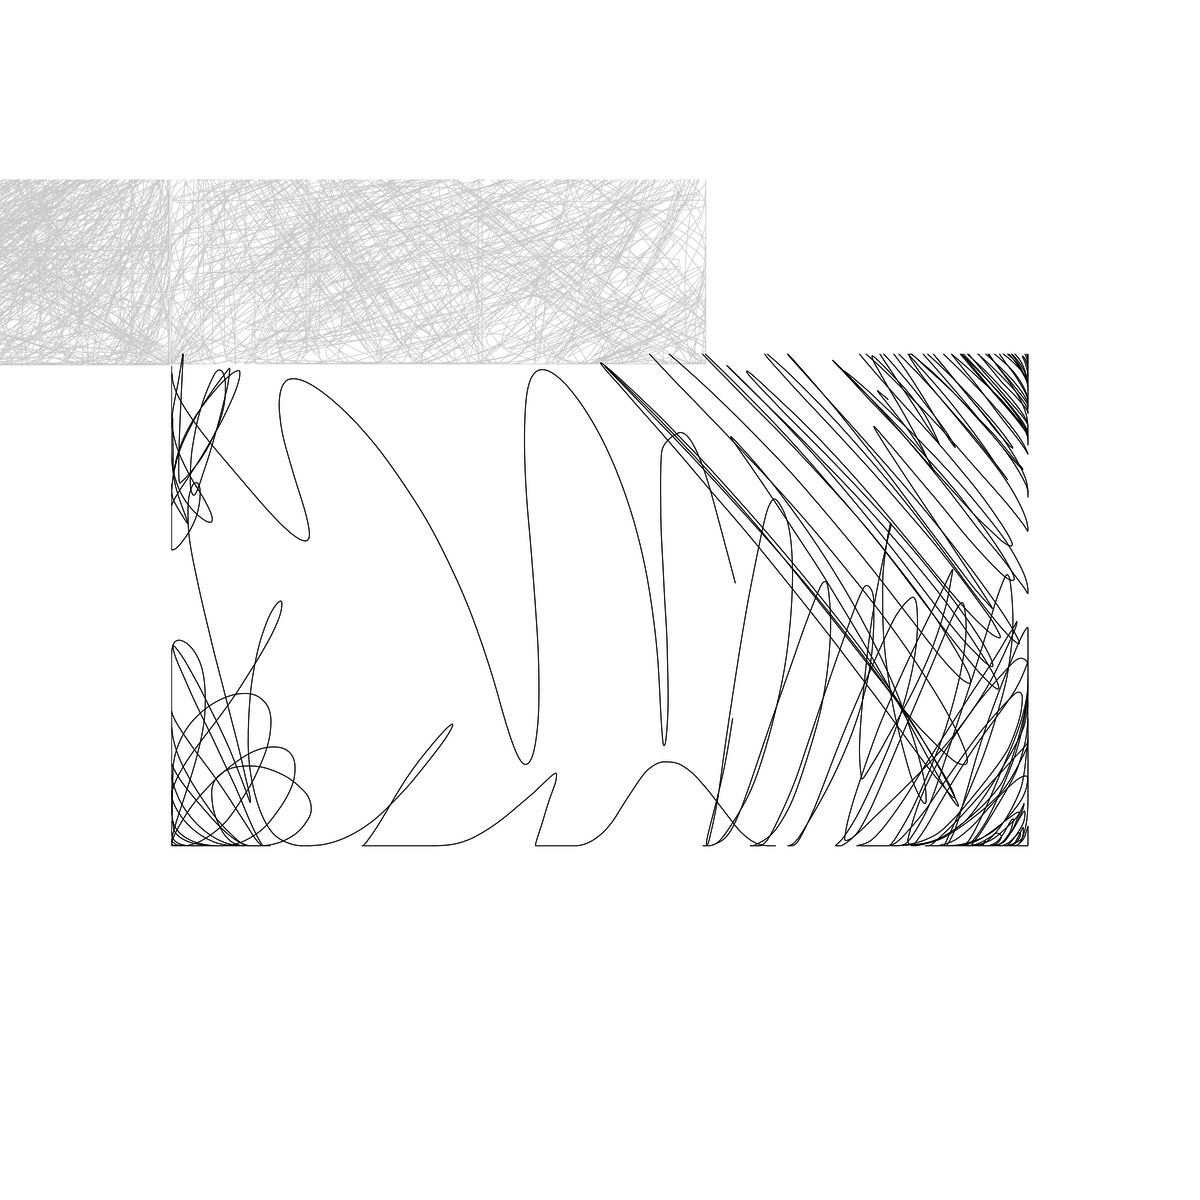 BAAAM drawing#17496 lat:52.4747352600097660lng: 13.4073343276977540